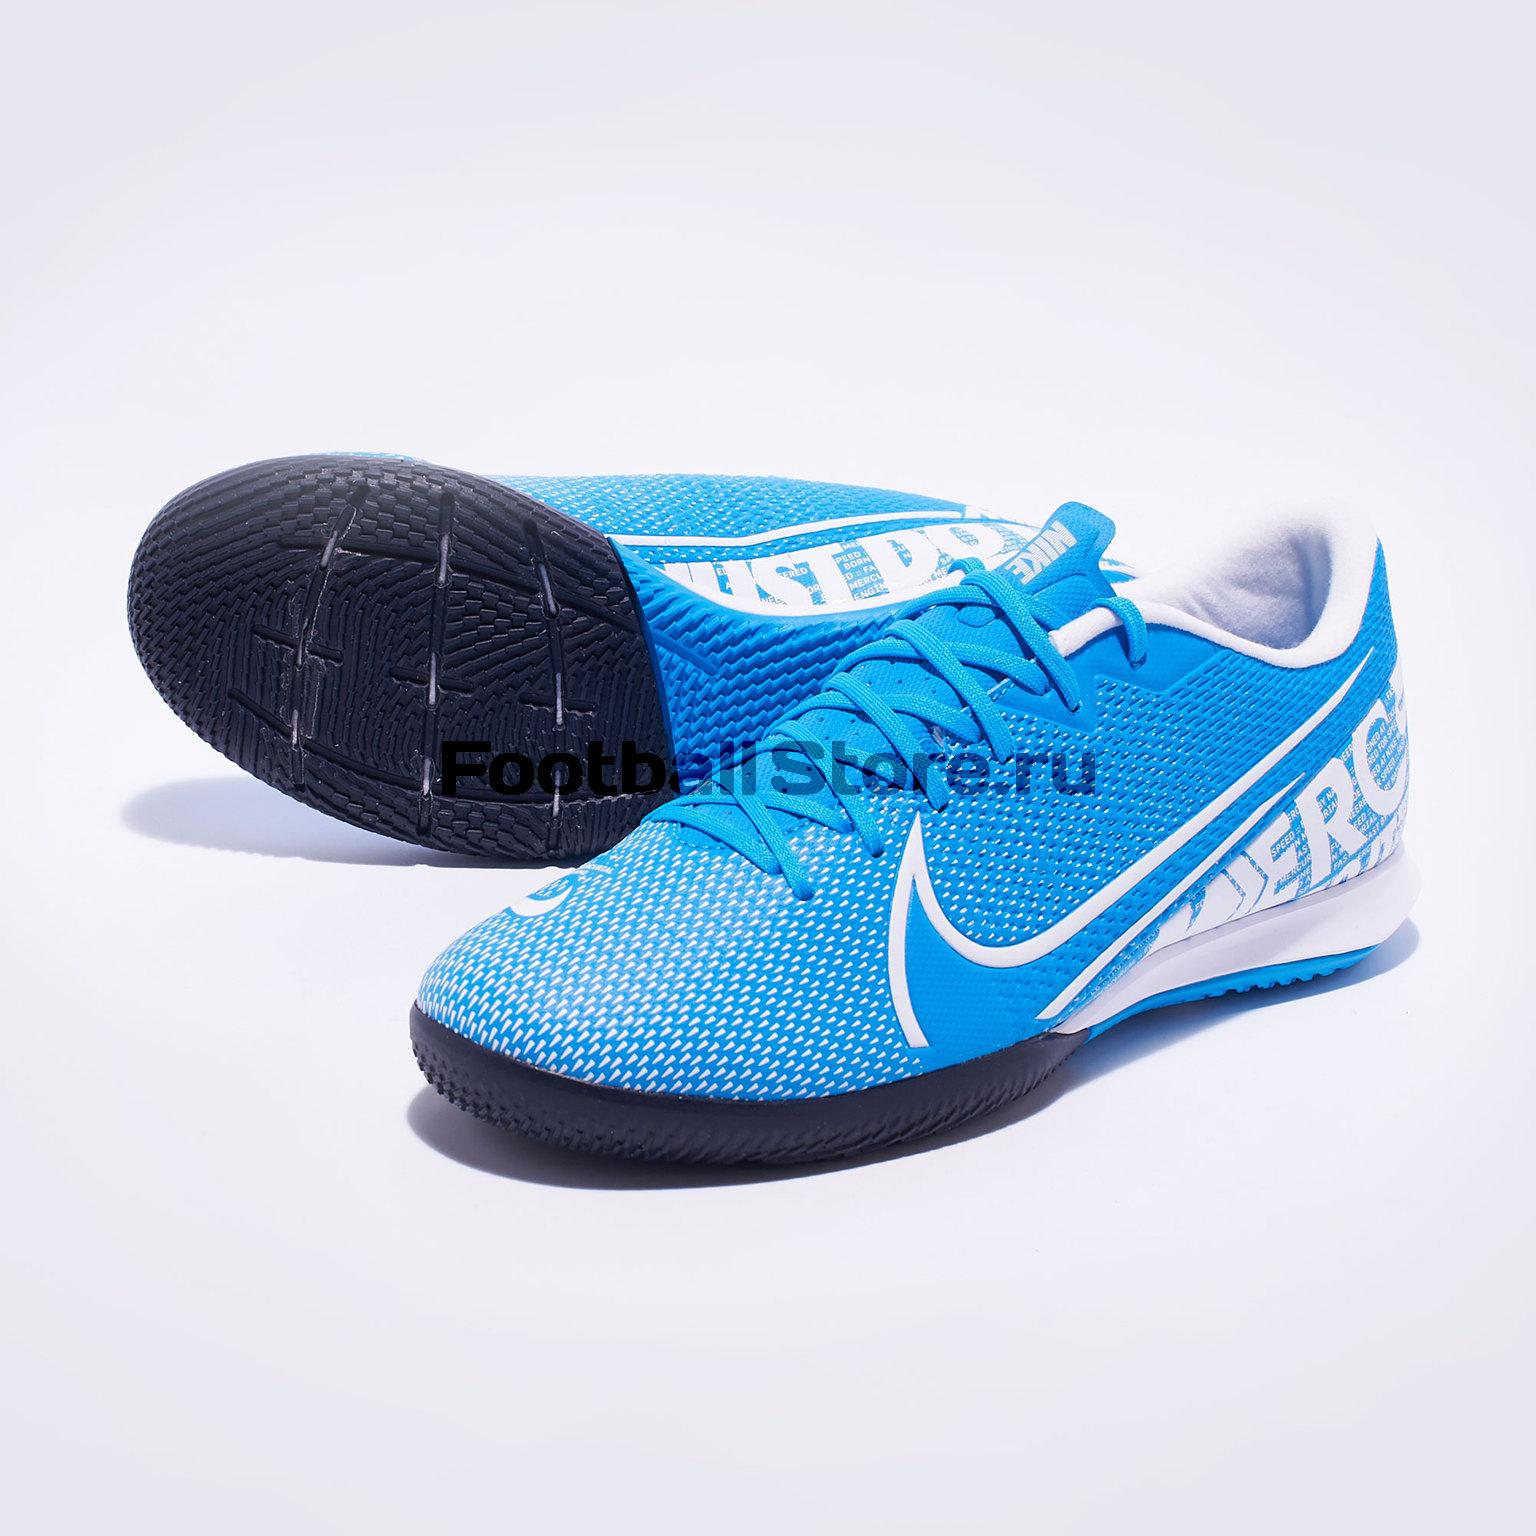 Футзалки Nike Vapor 13 Academy IC AT7993-414 обувь для зала nike vapor 12 academy neymar ic ao3122 710